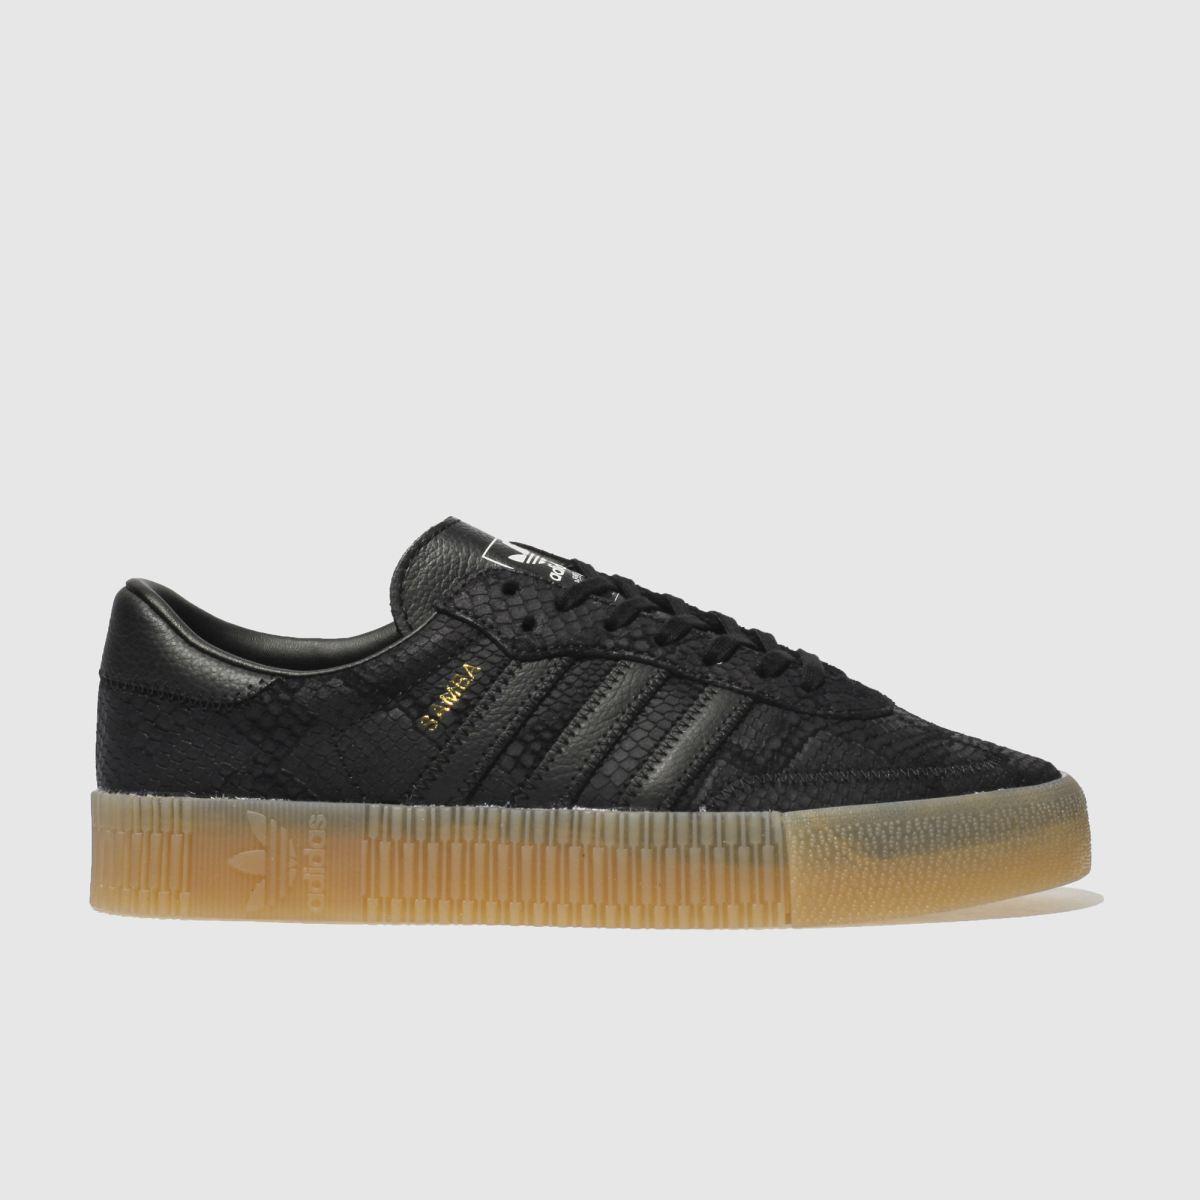 Adidas Black Sambarose Trainers